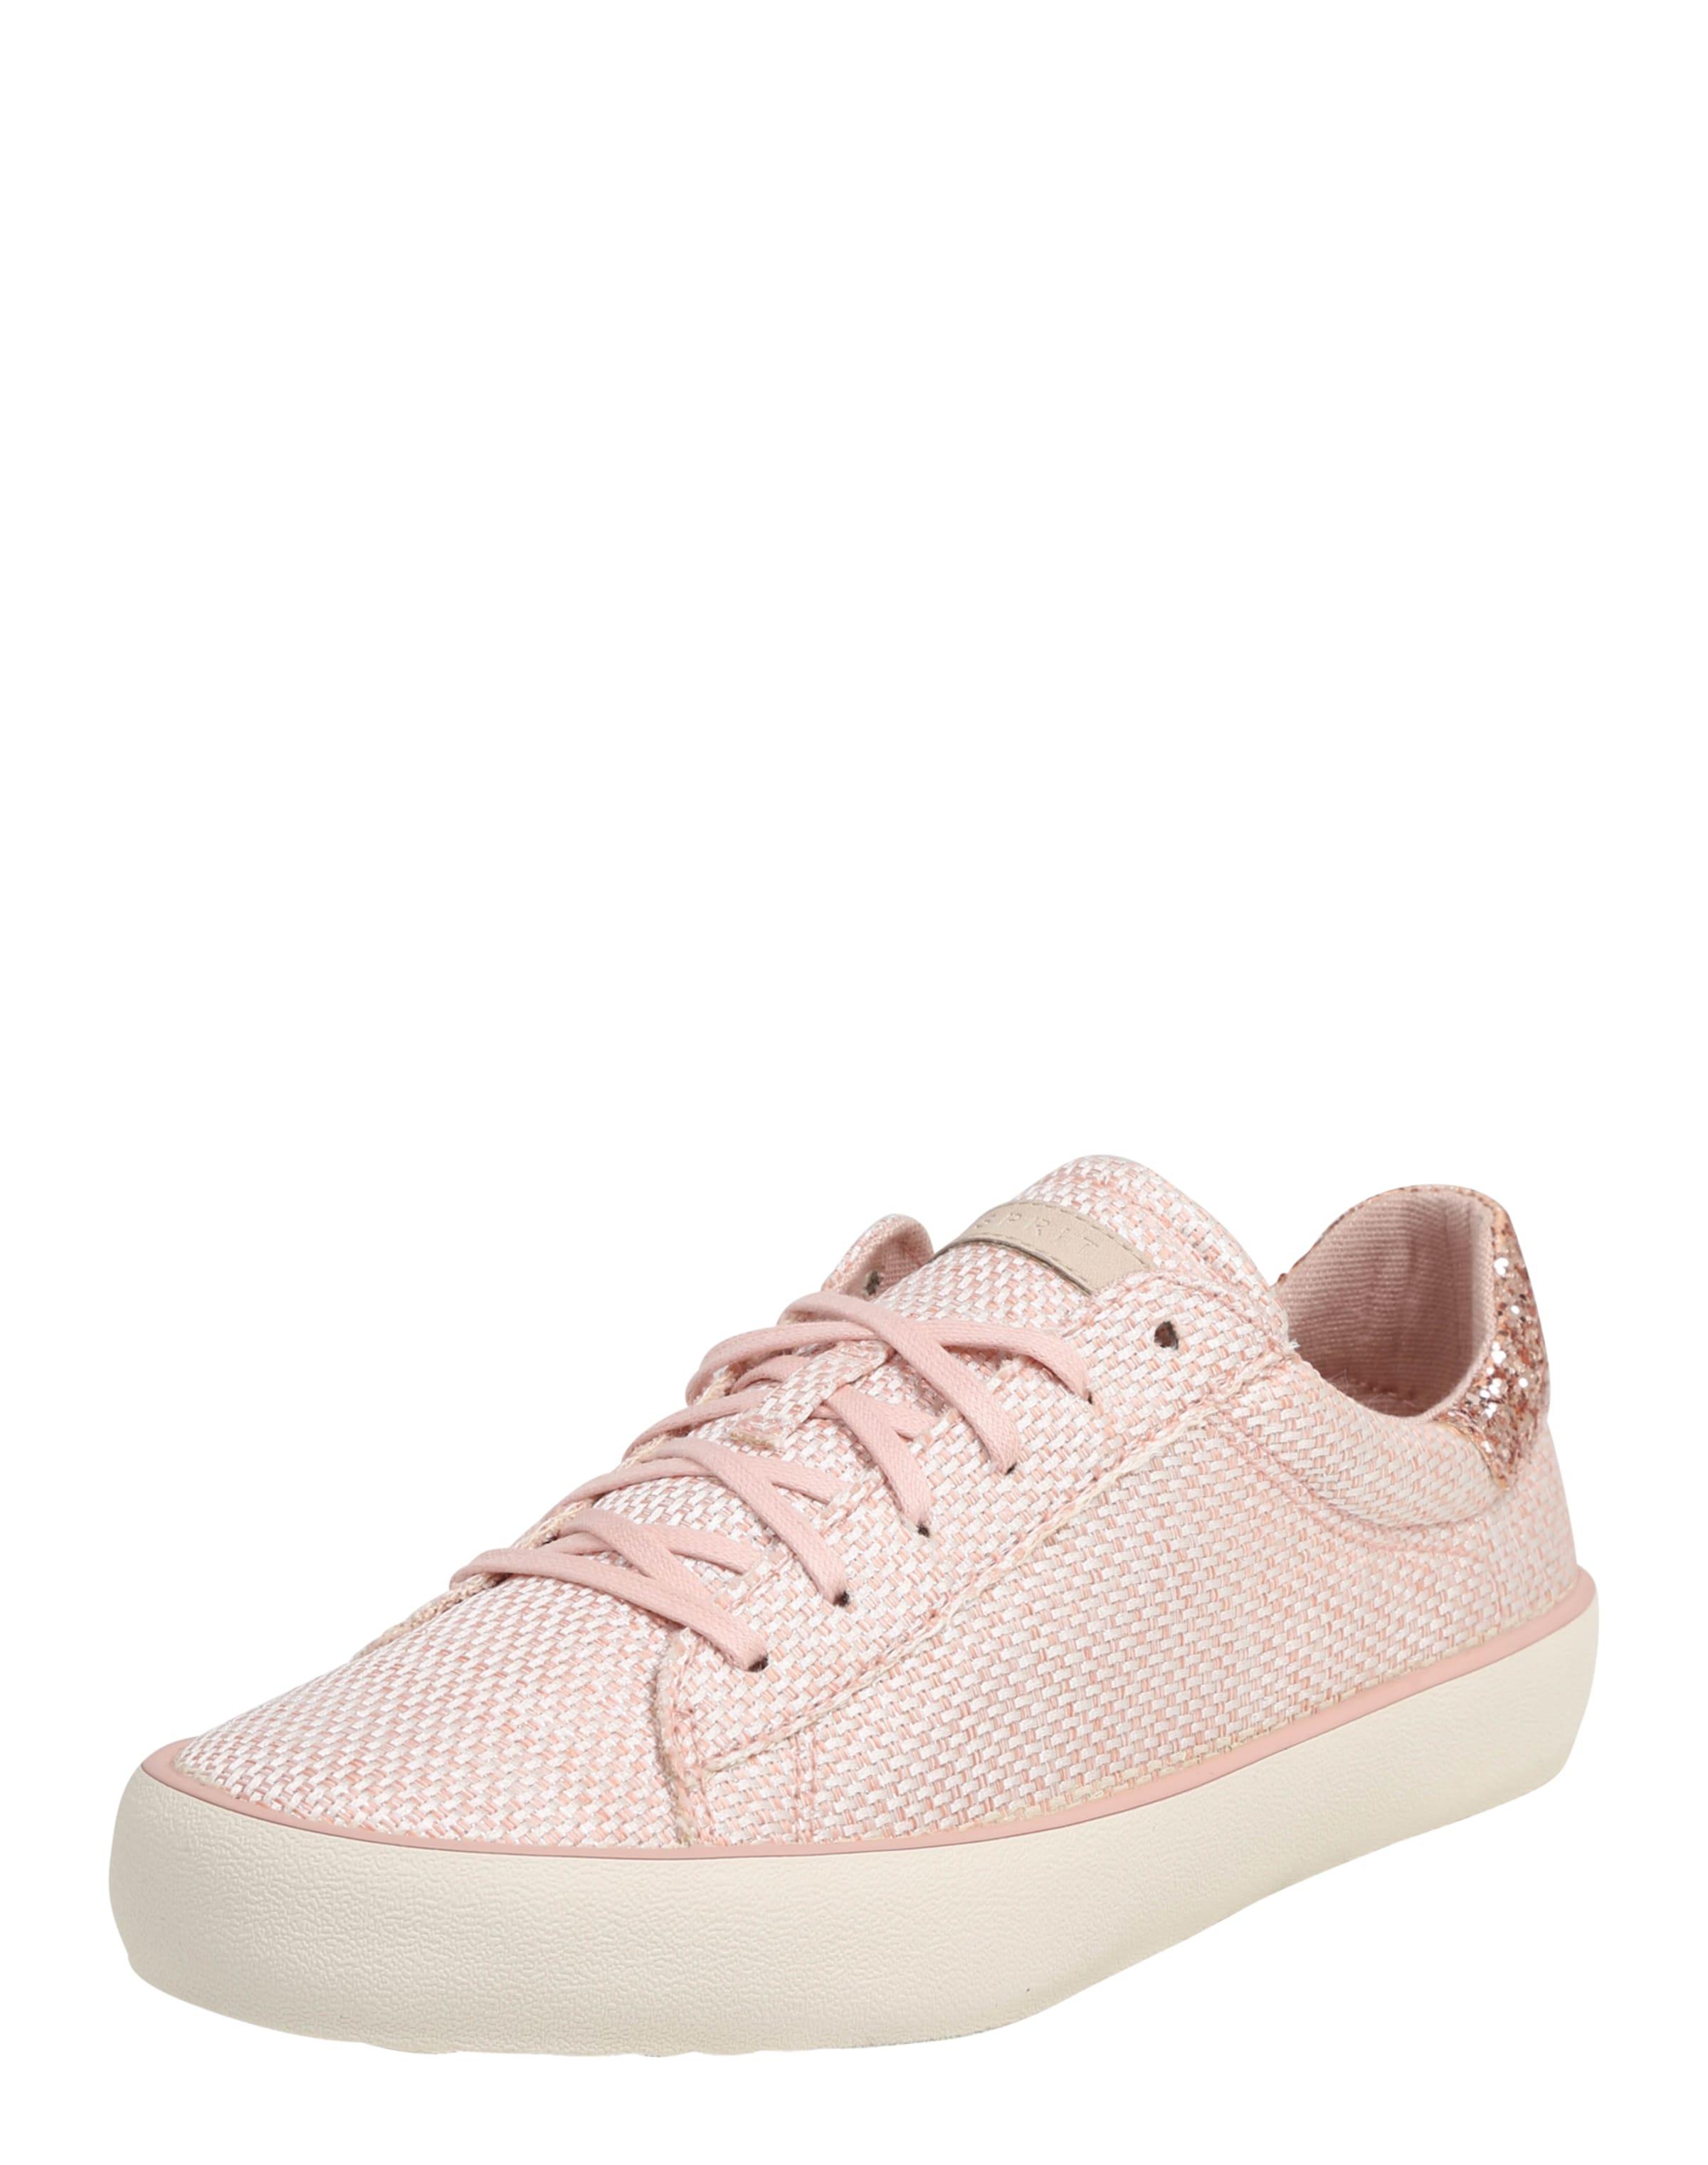 ESPRIT Sneaker Low Mandy Verschleißfeste billige Schuhe